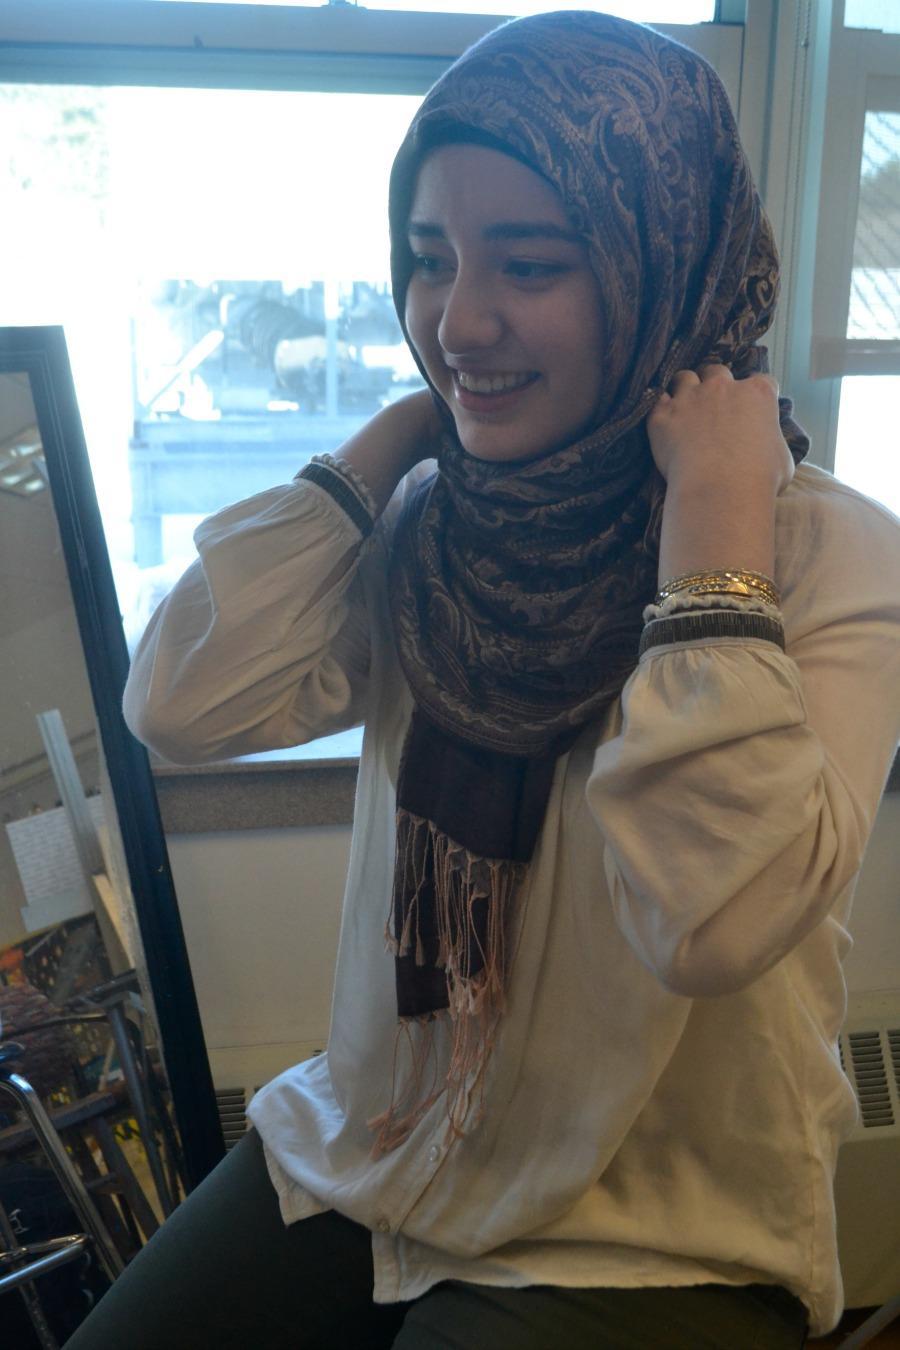 Senior Nargis Rajai wears her hijab as part of her Islamic culture.